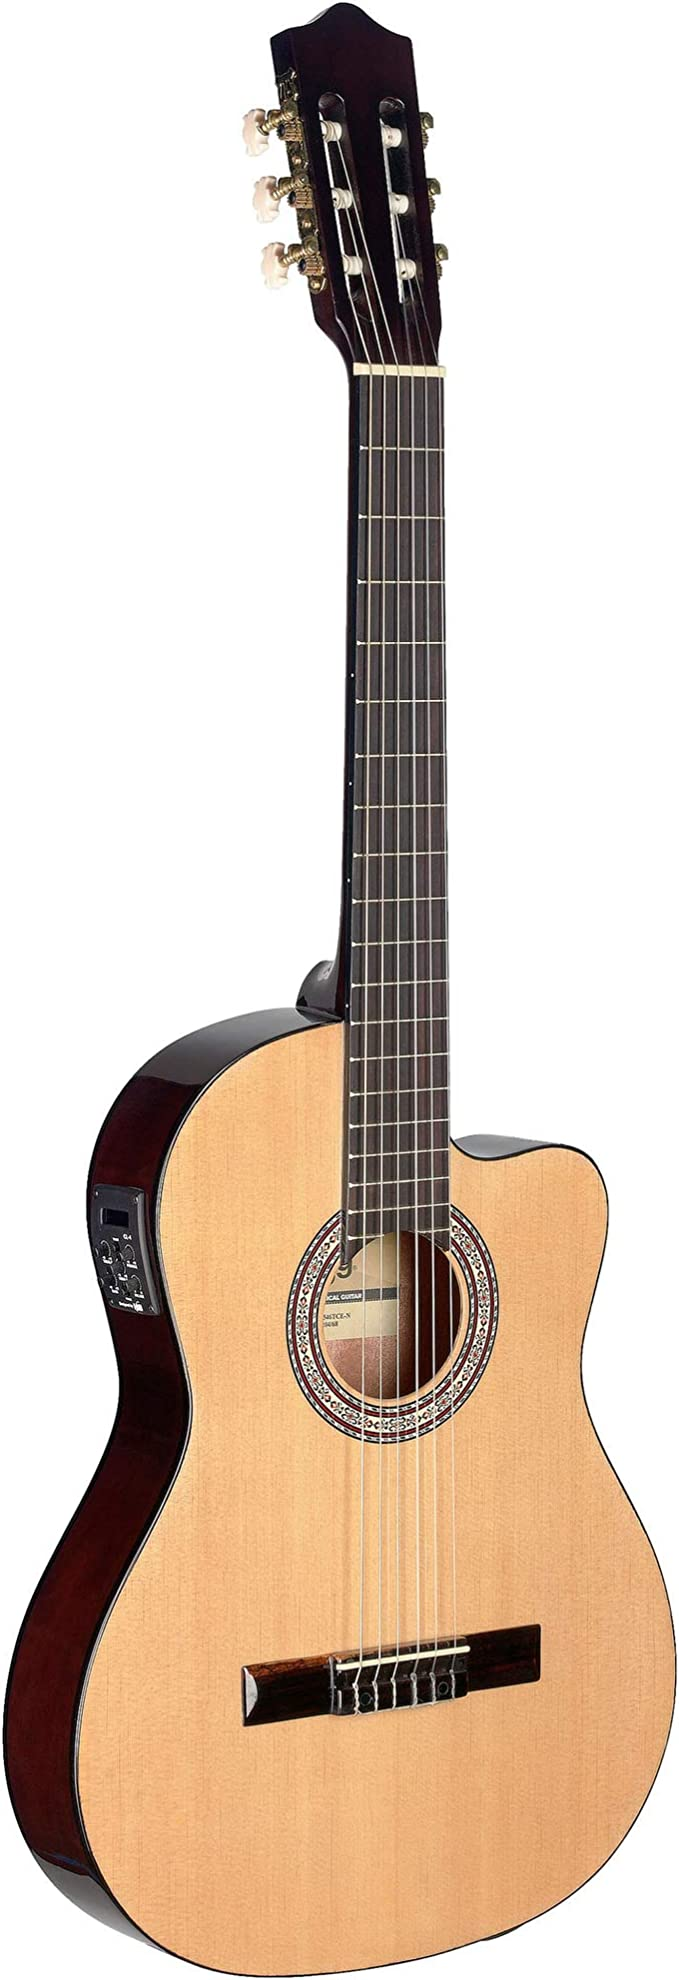 Stagg c546tce - n Electroacústica Natural guitarra clásica: Amazon ...